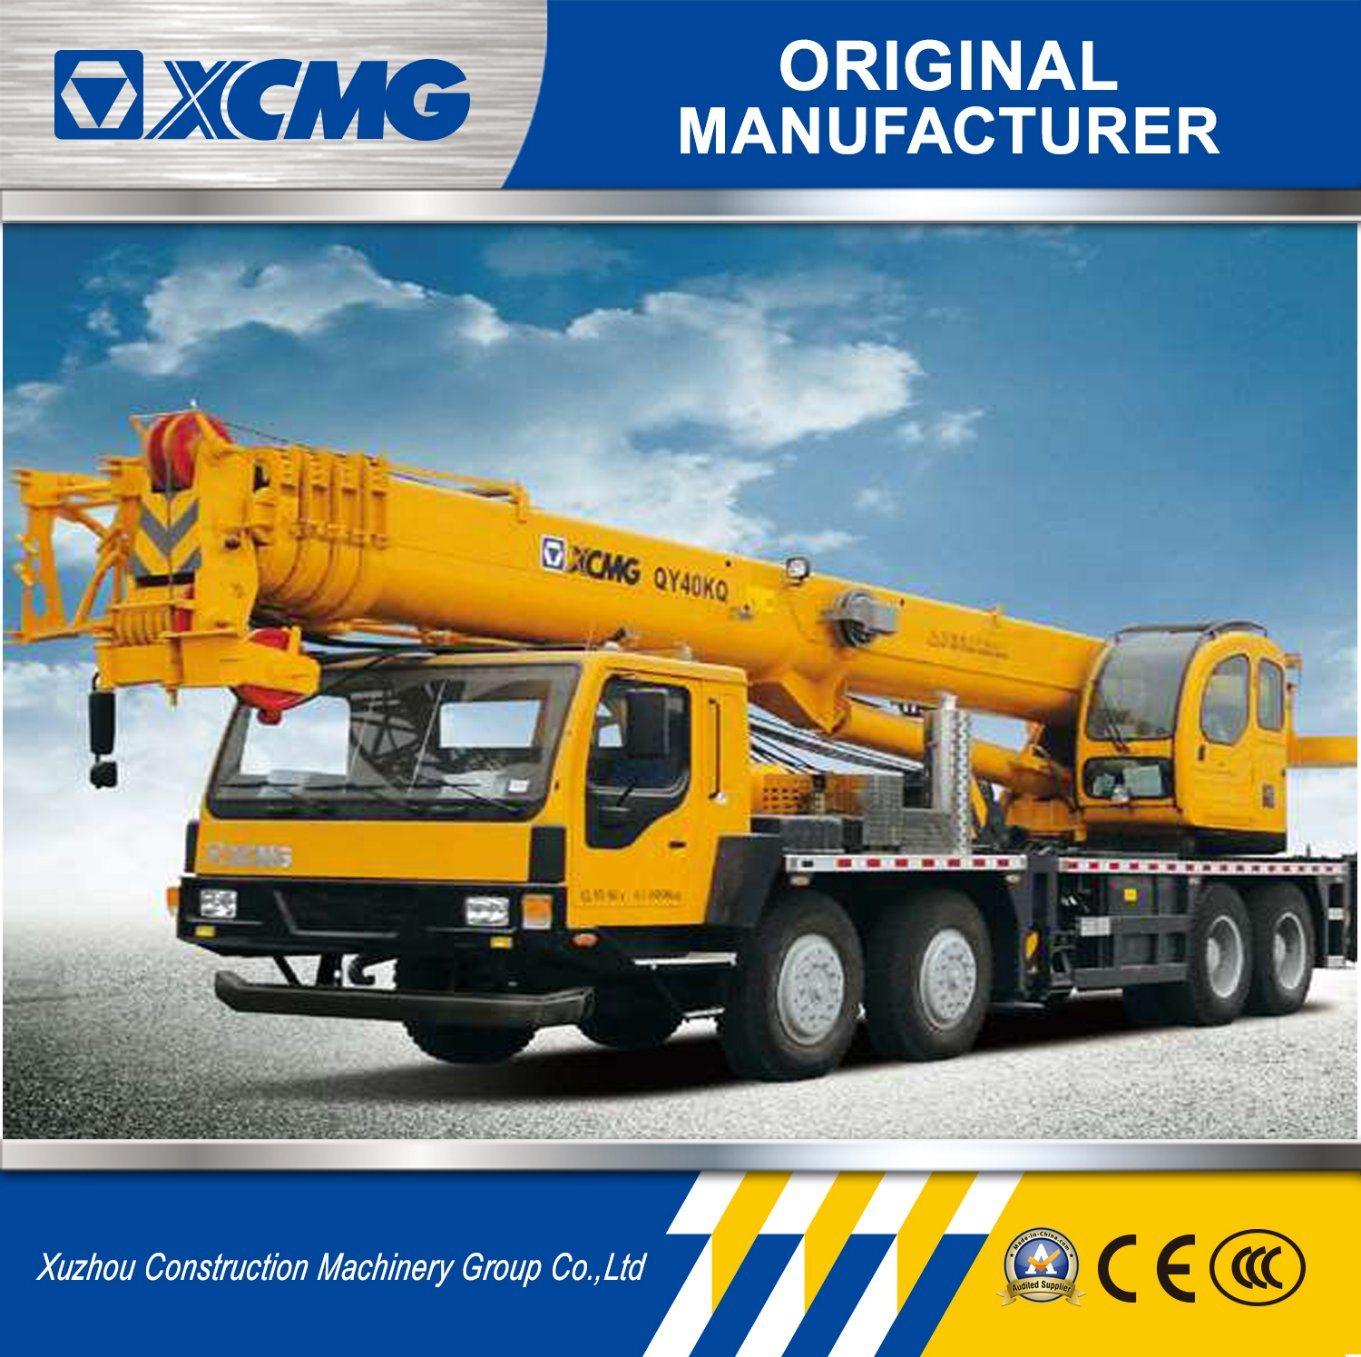 [Hot Item] XCMG Official Manufacturer Qy40kq 40ton Truck Crane 40ton Mobile  Crane